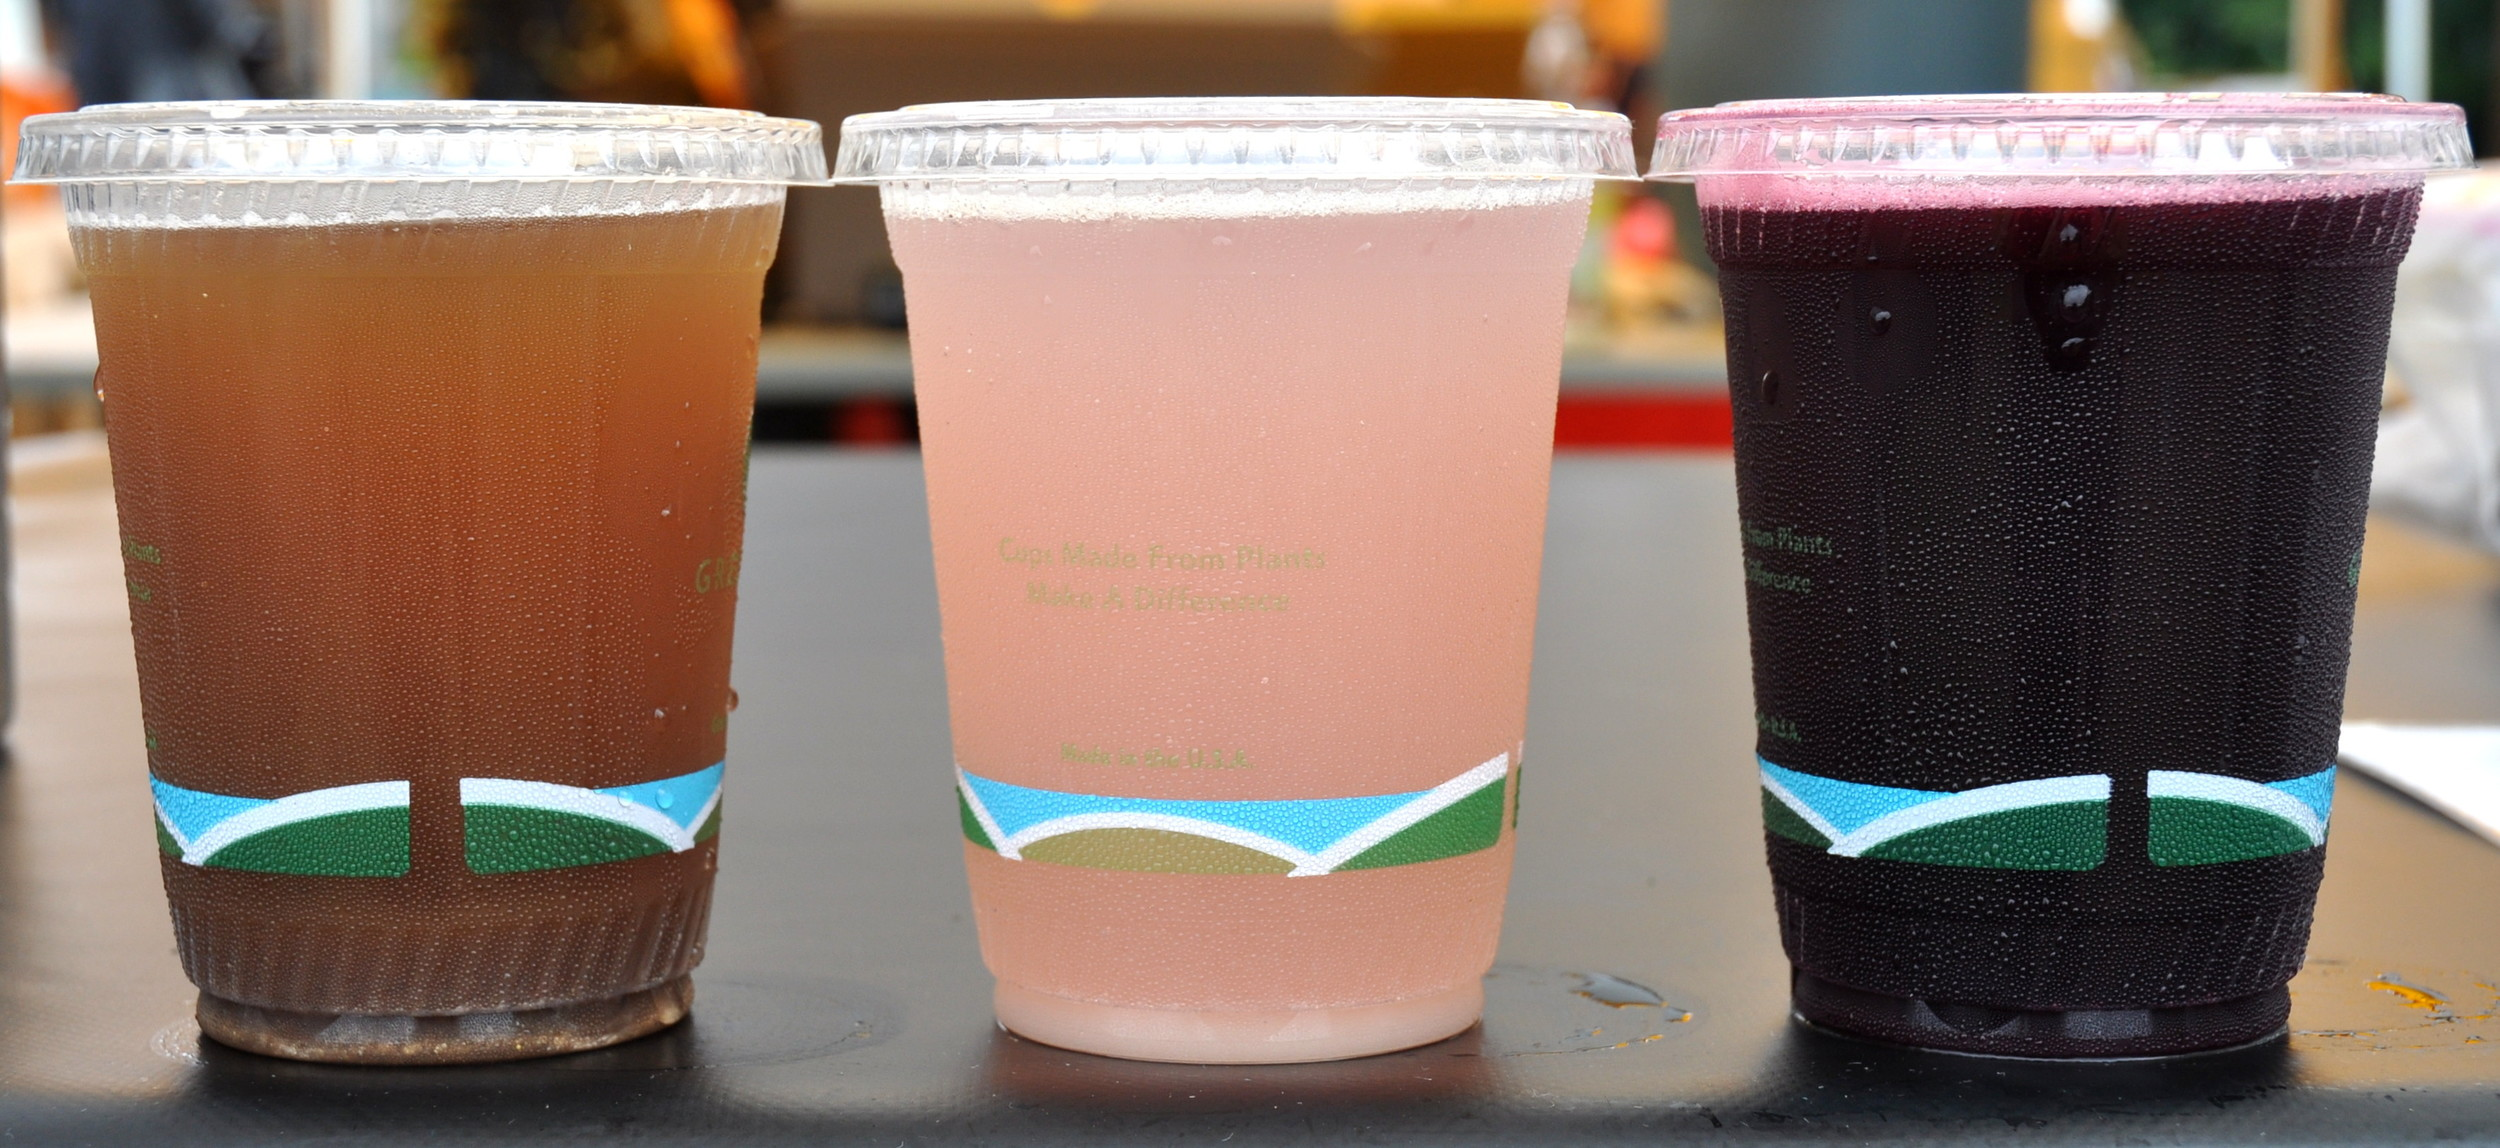 Summer flavors from Soda Jerk Soda. Photo copyright 2014 by Zachary D. Lyons.